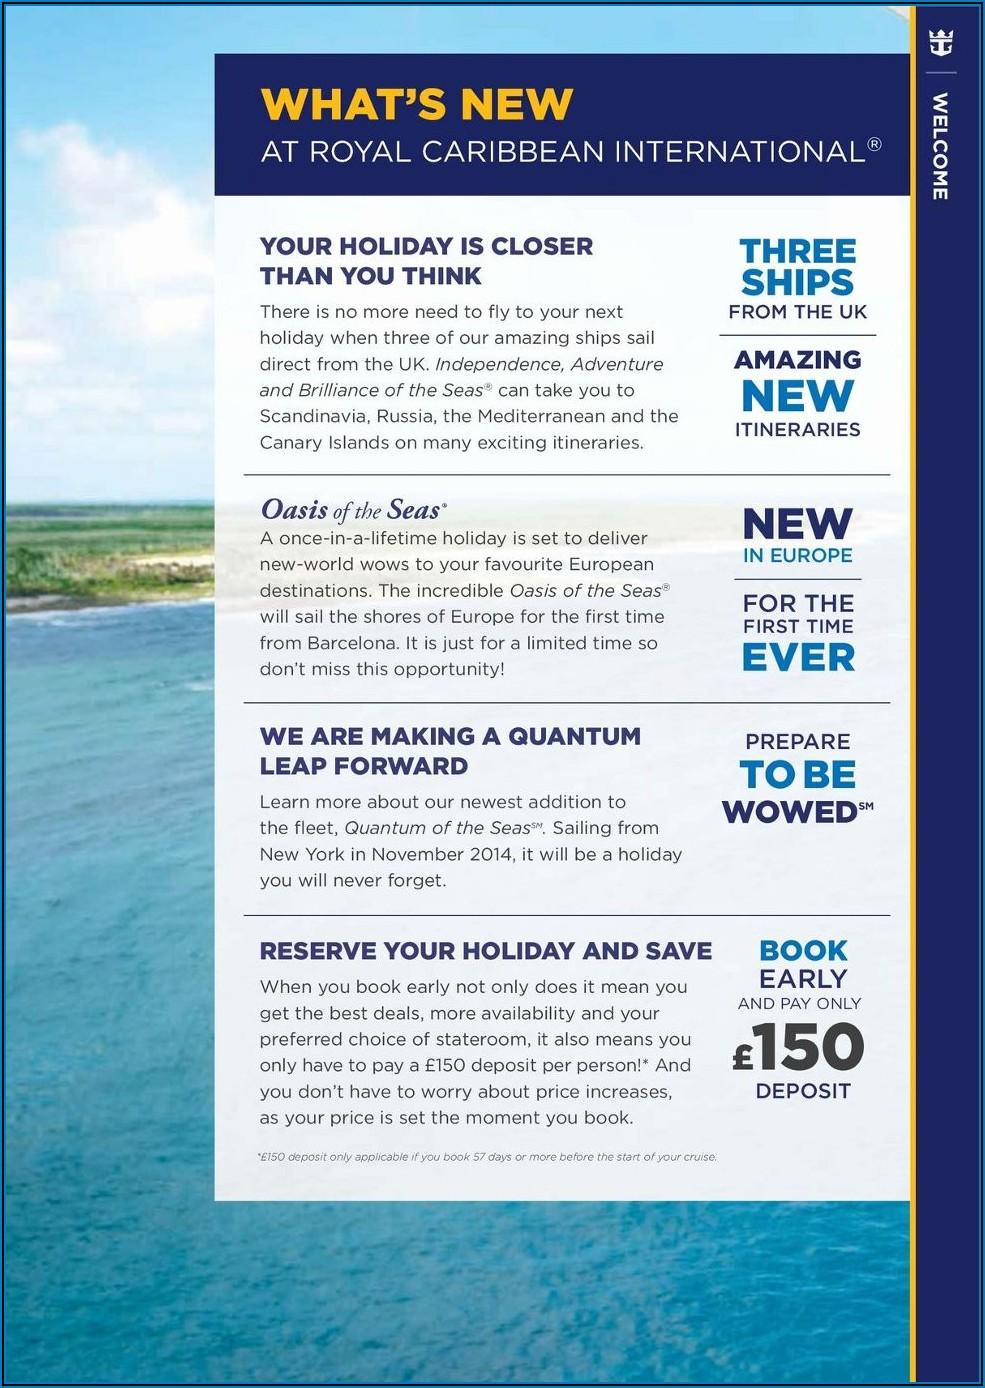 Royal Caribbean Shore Excursions Brochure